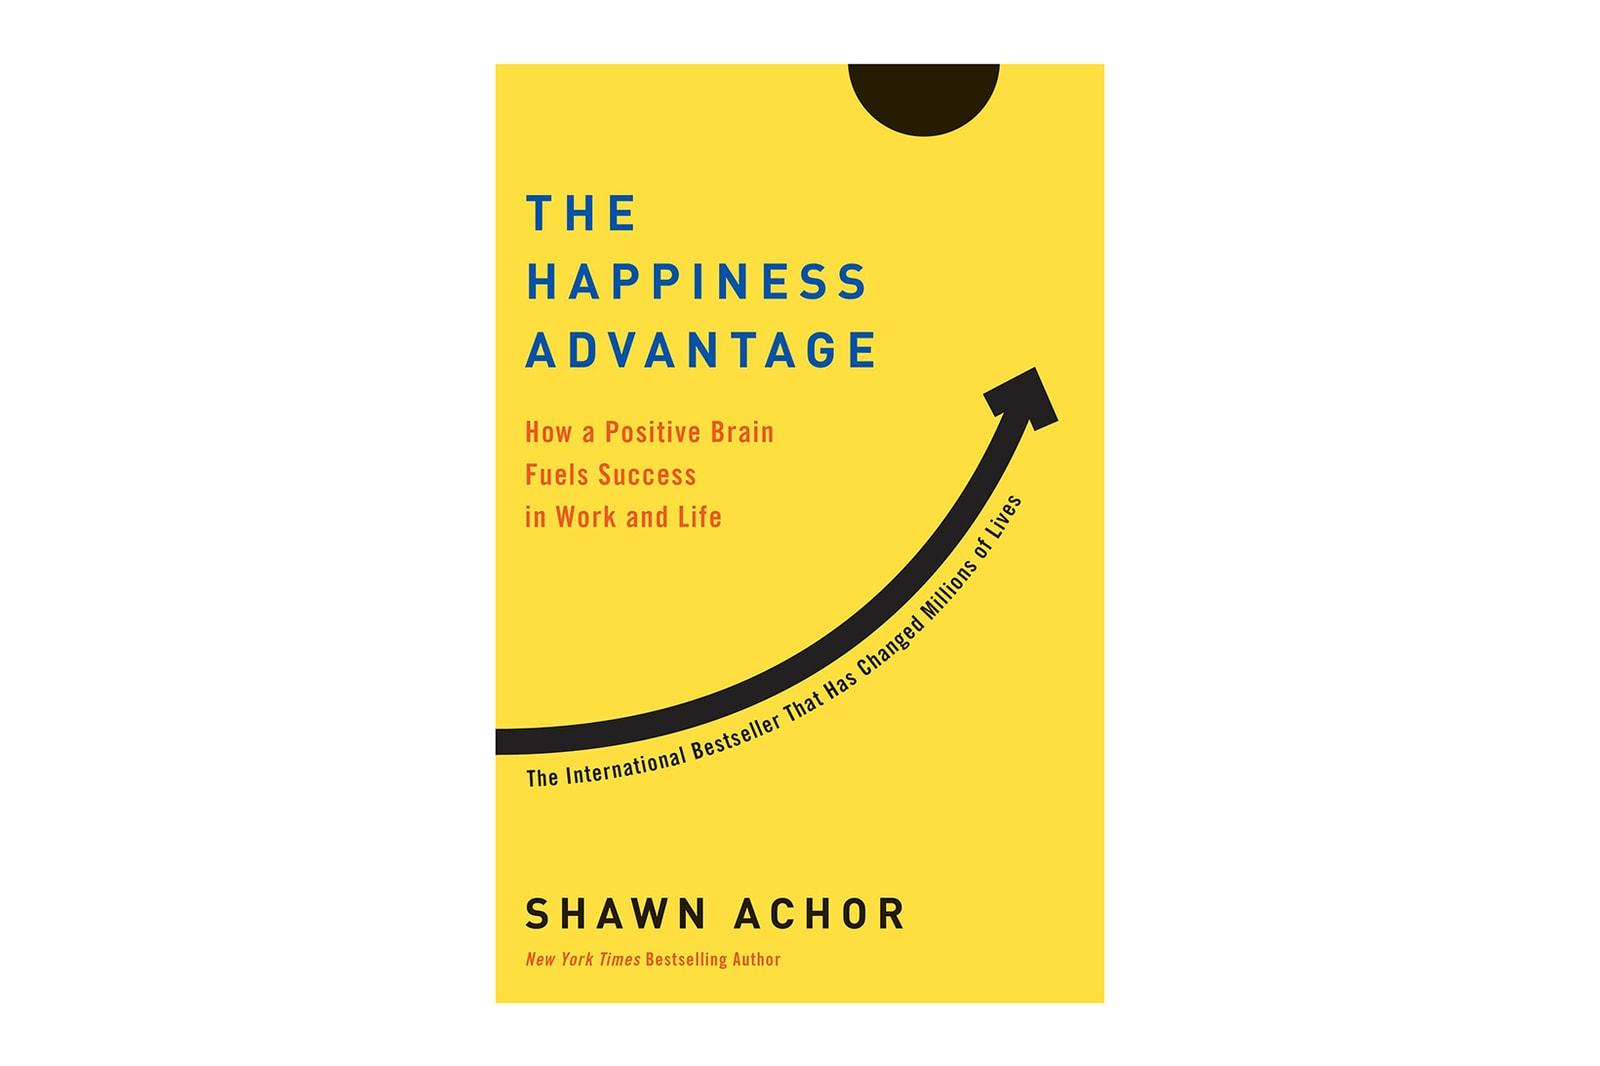 best self help improvement books non fiction literature reading list marie kondo mark manson shawn achor annie f downs phakchok rinpoche